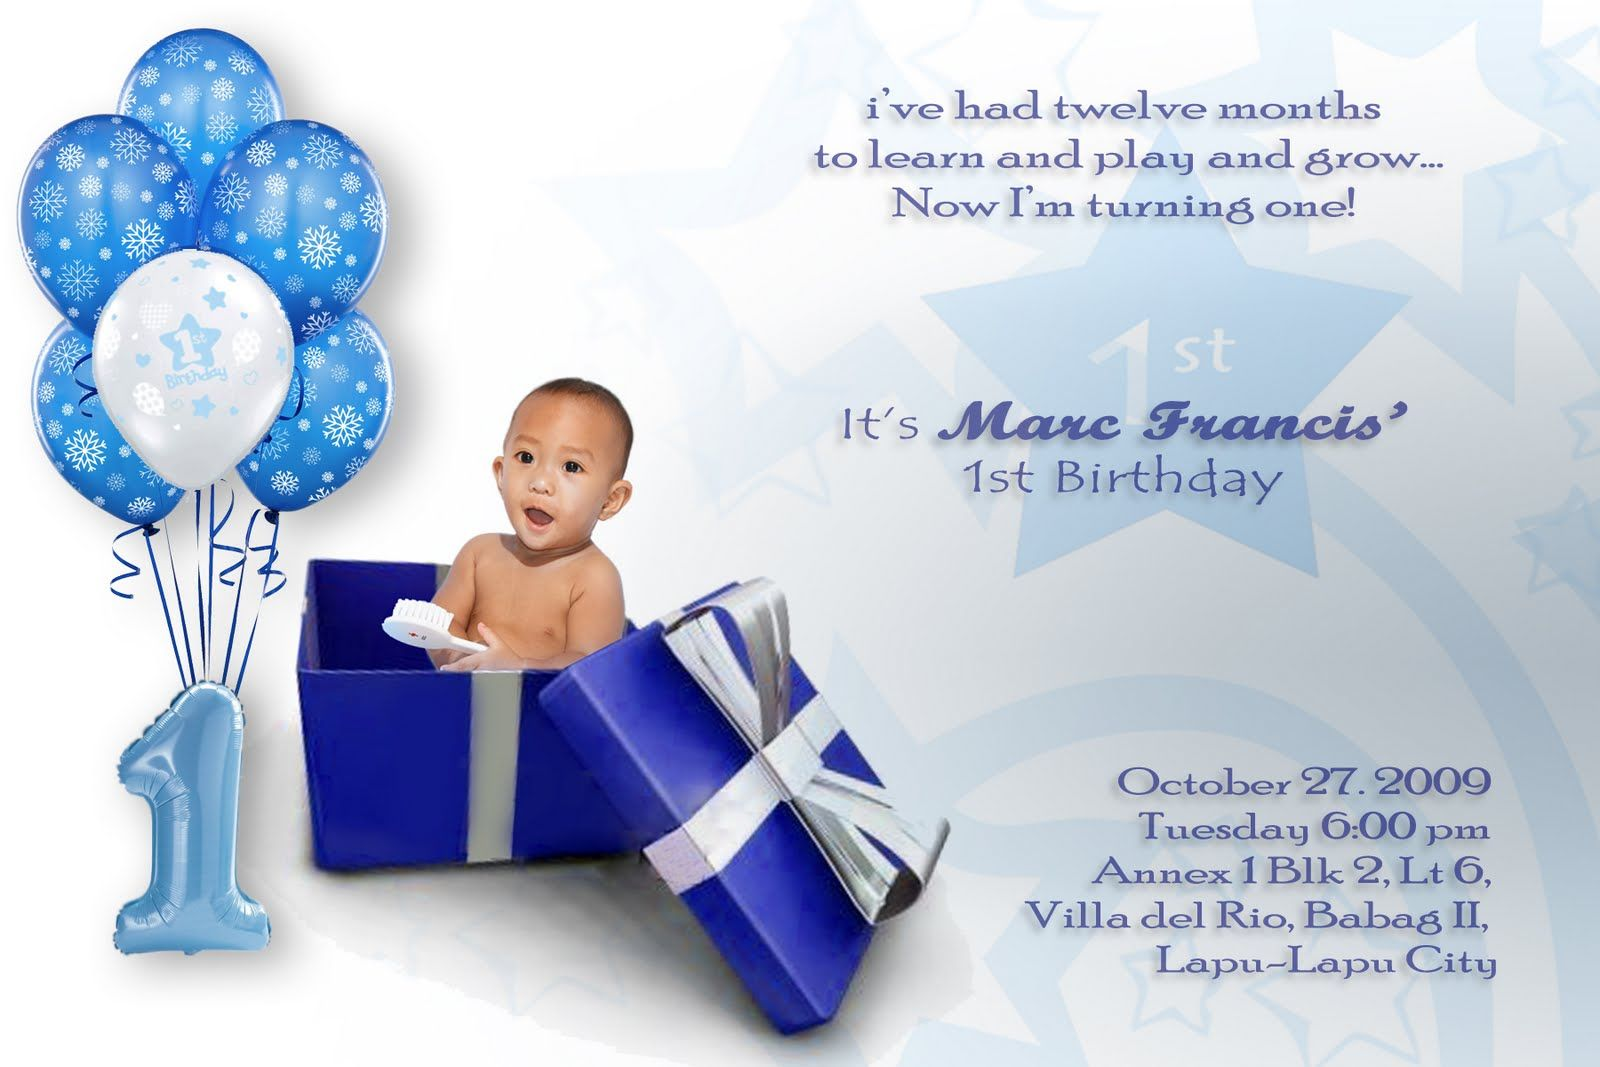 Birthday invitation cards for boys birthday invitation cards for birthday invitation cards for boys bookmarktalkfo Choice Image